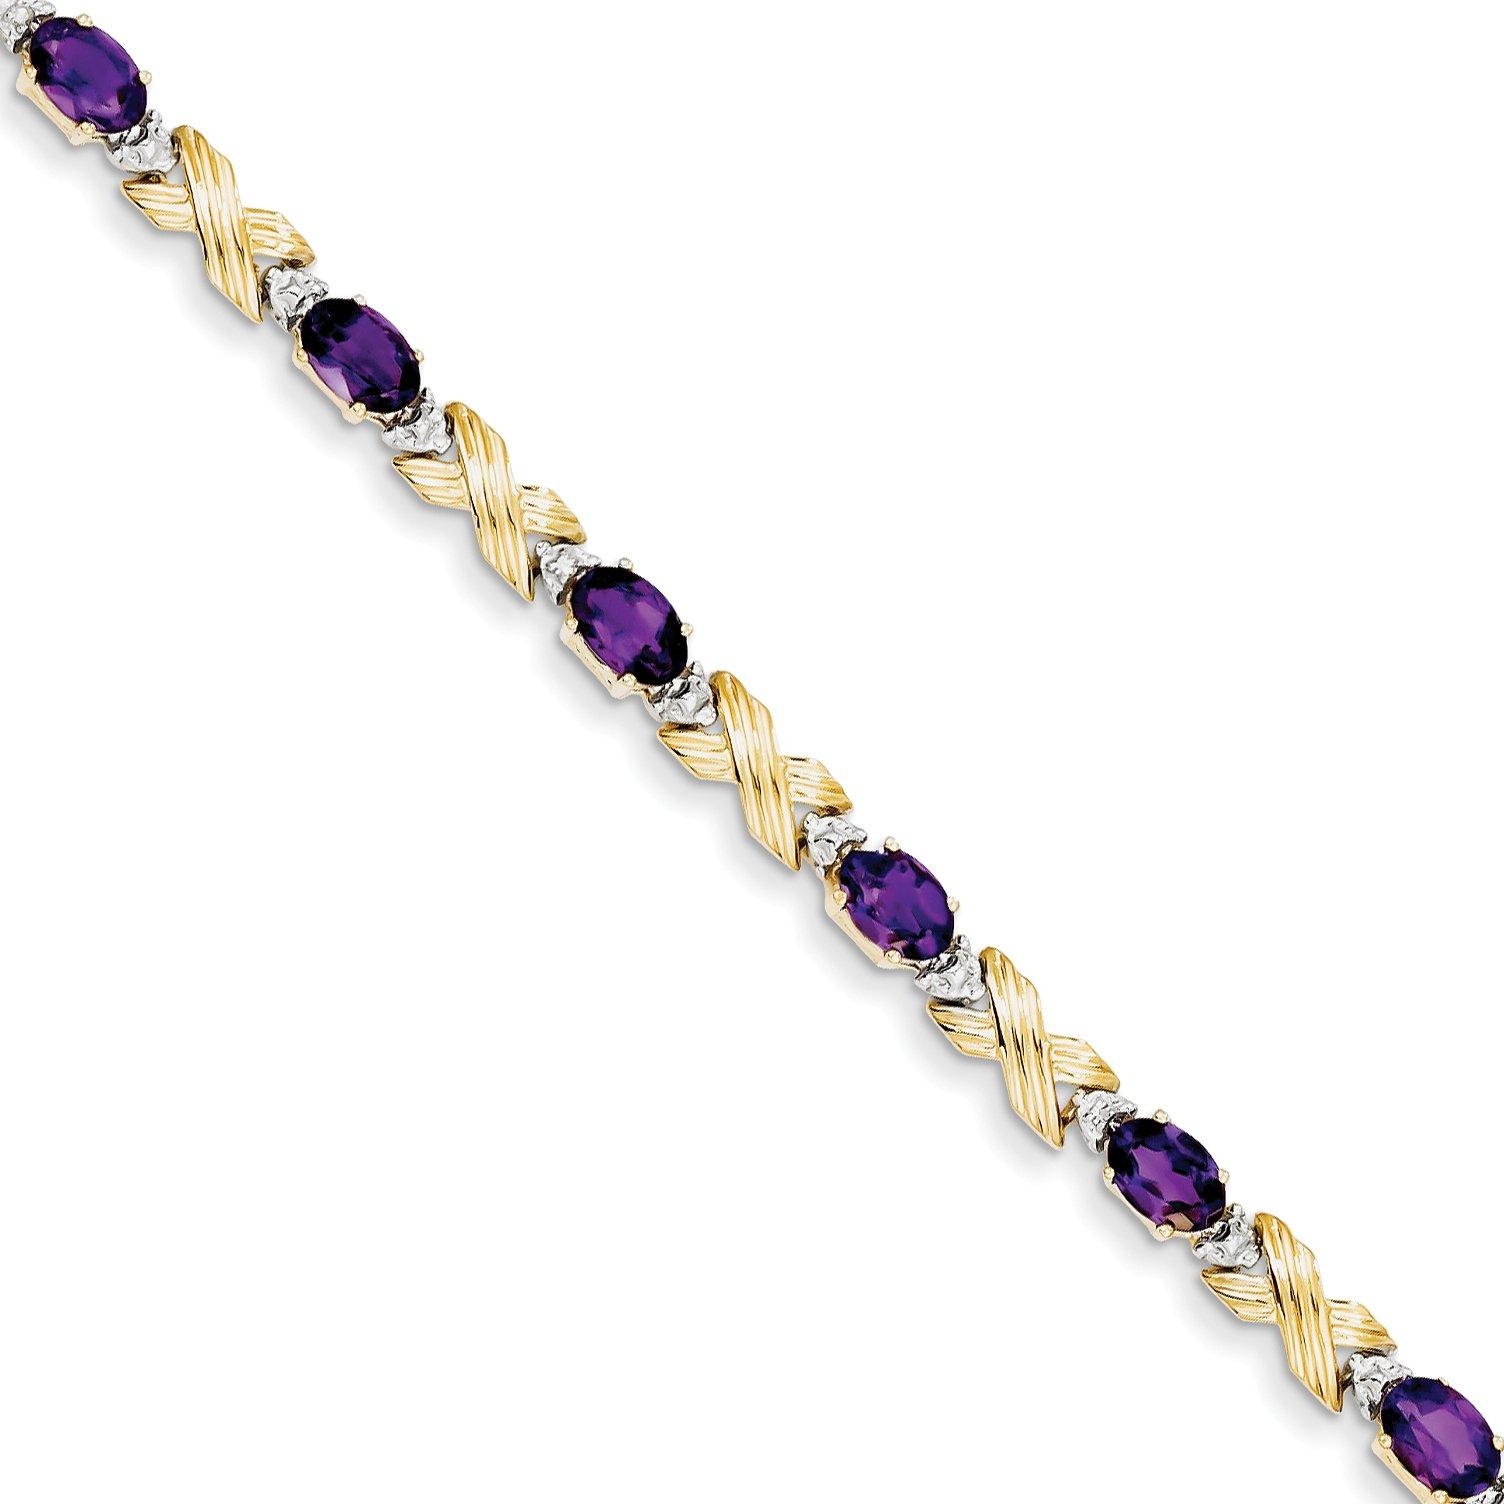 ICE CARATS 14k Yellow Gold Amethyst/diamond Bracelet 7 Inch Gemstone Fine Jewelry Gift Set For Women Heart